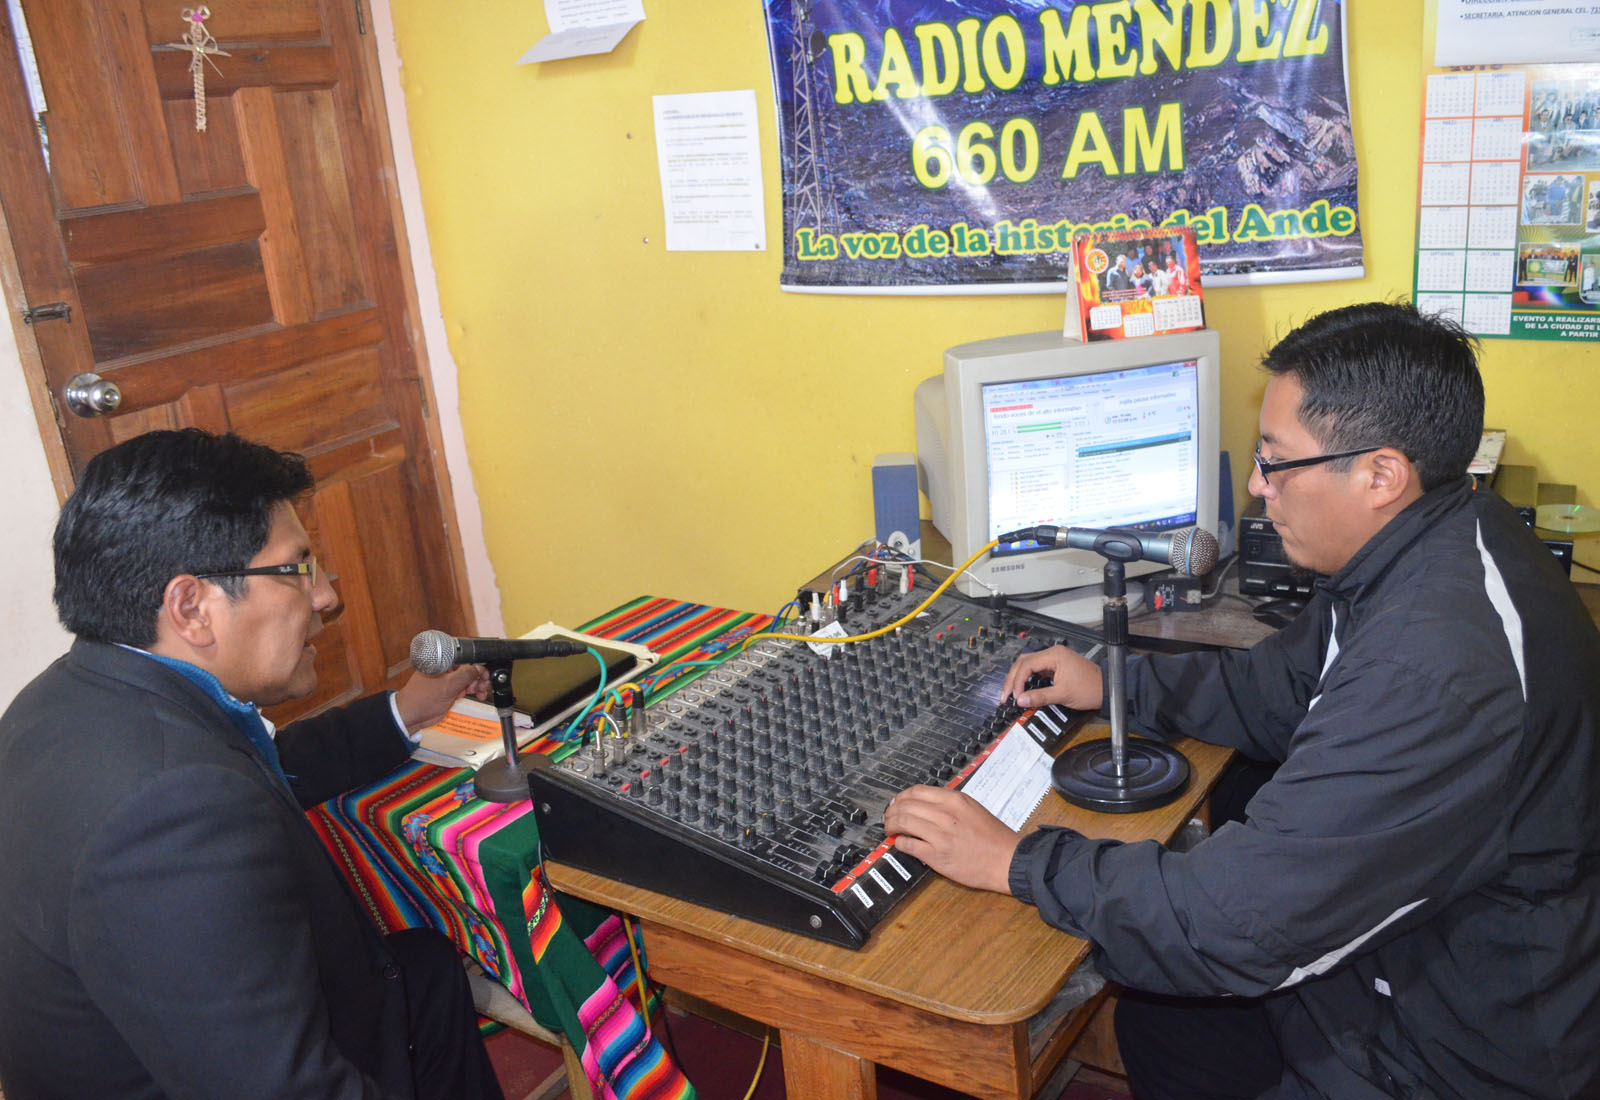 Choquehuanca entrevistado por Wilson Laime en radio Méndez 660 AM